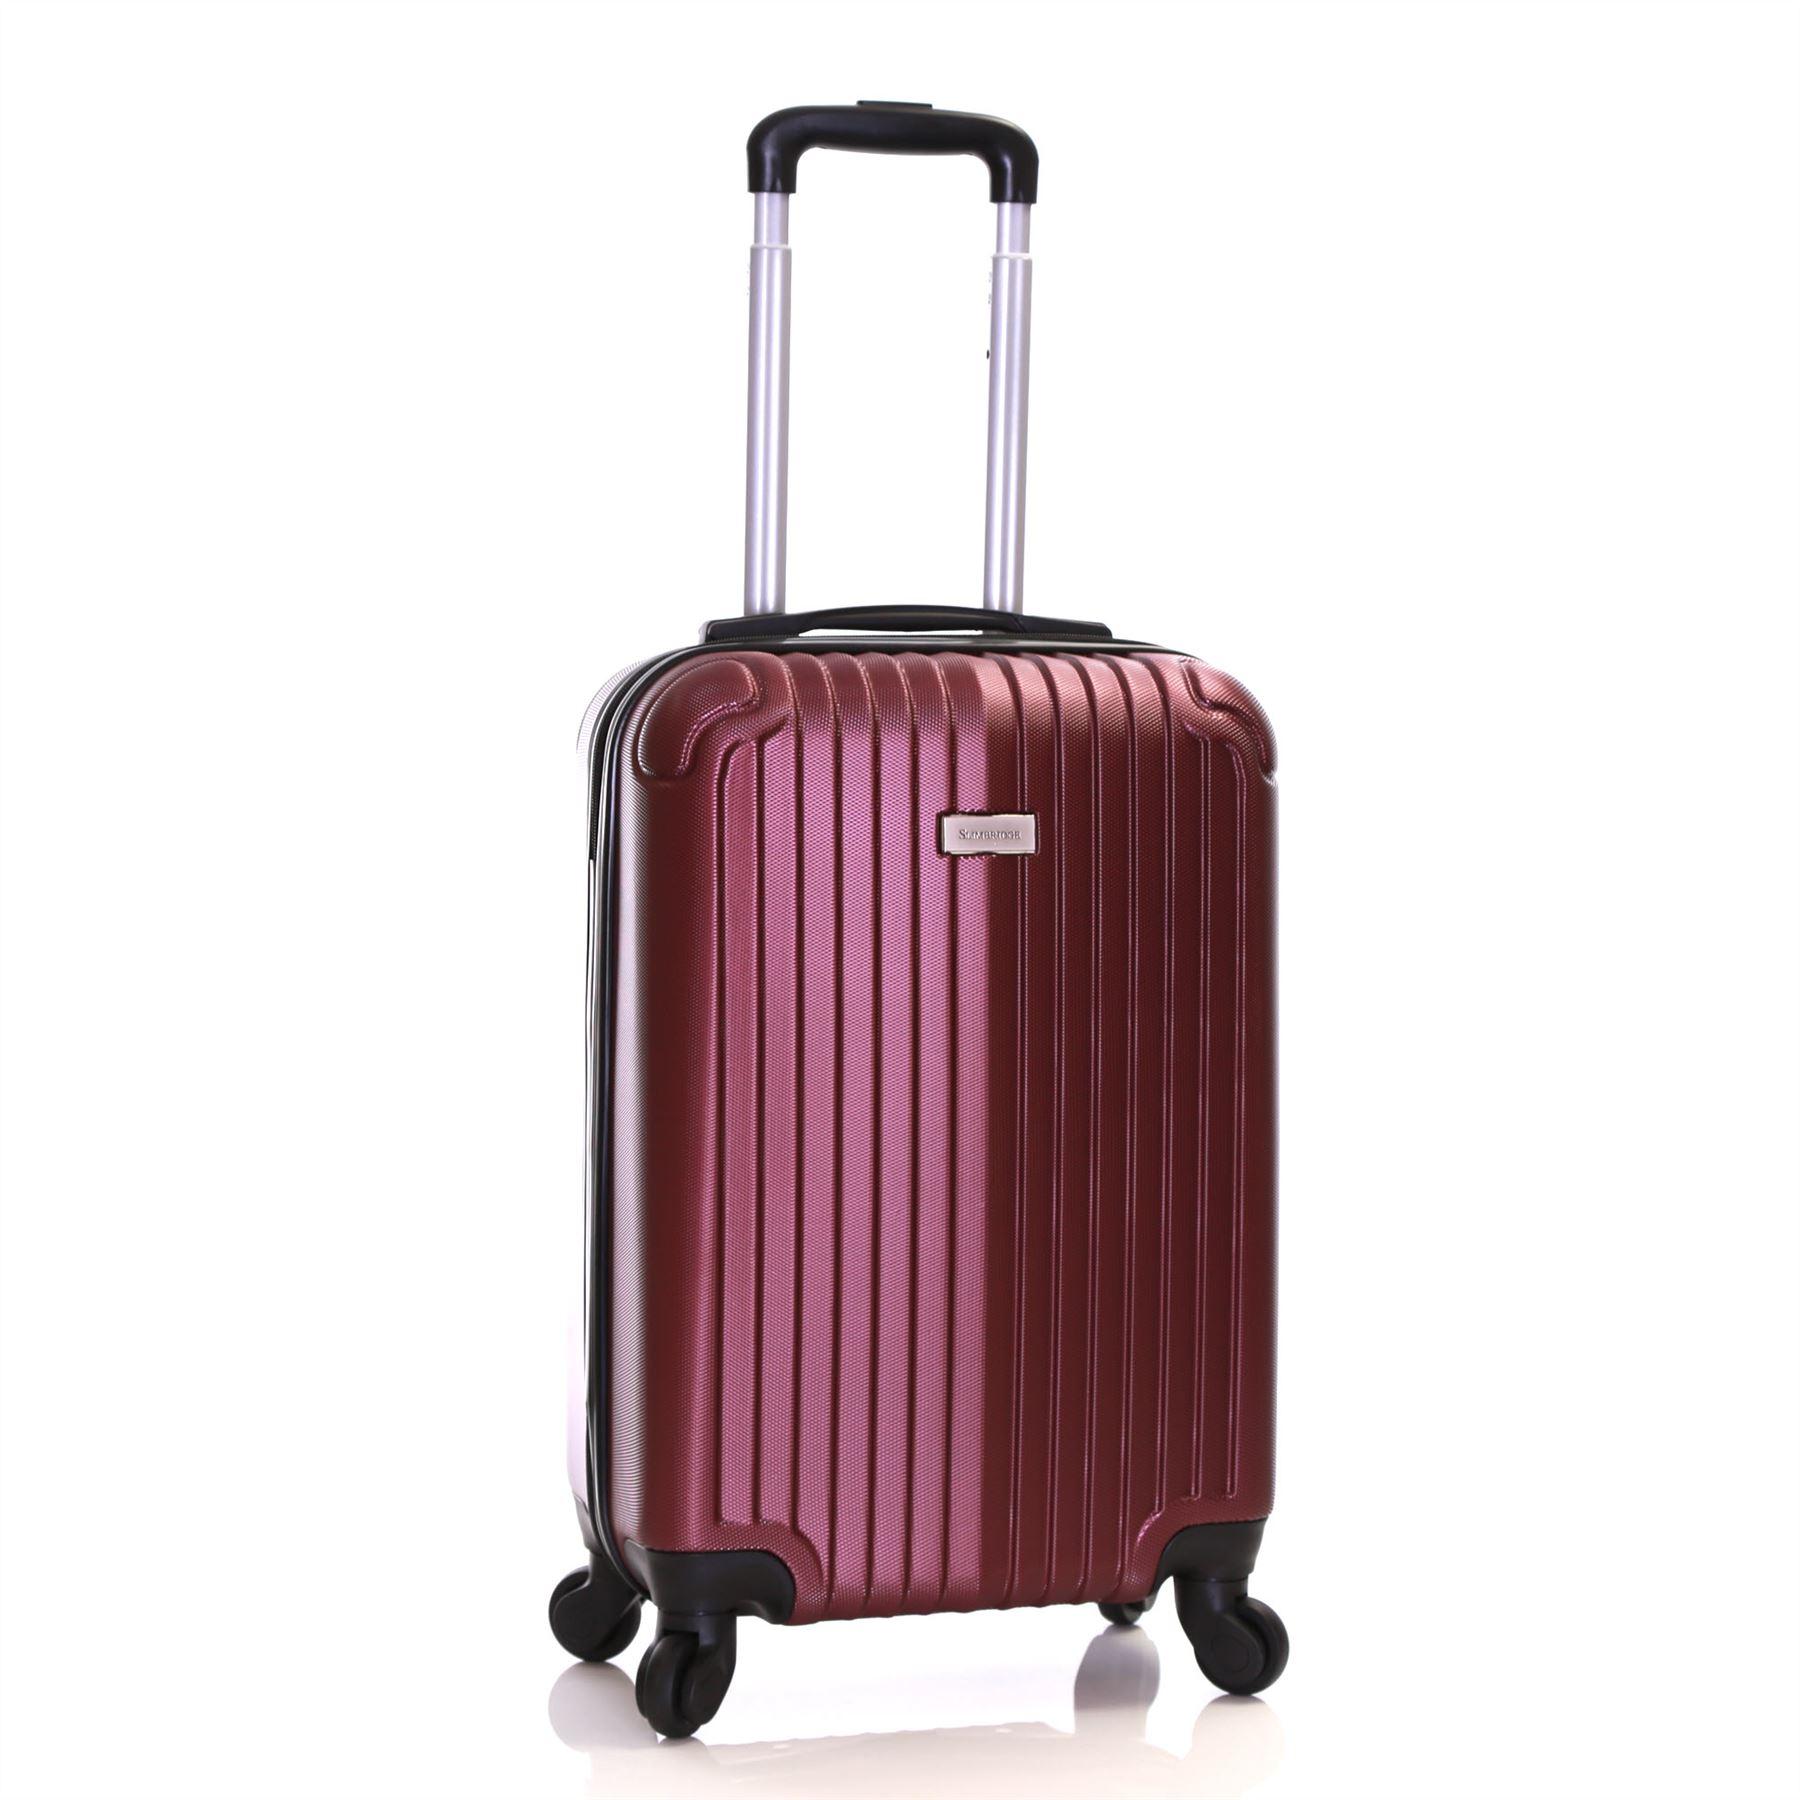 ryanair easyjet dur 55 cm cabine approuv spinner trolley valise bagage case ebay. Black Bedroom Furniture Sets. Home Design Ideas